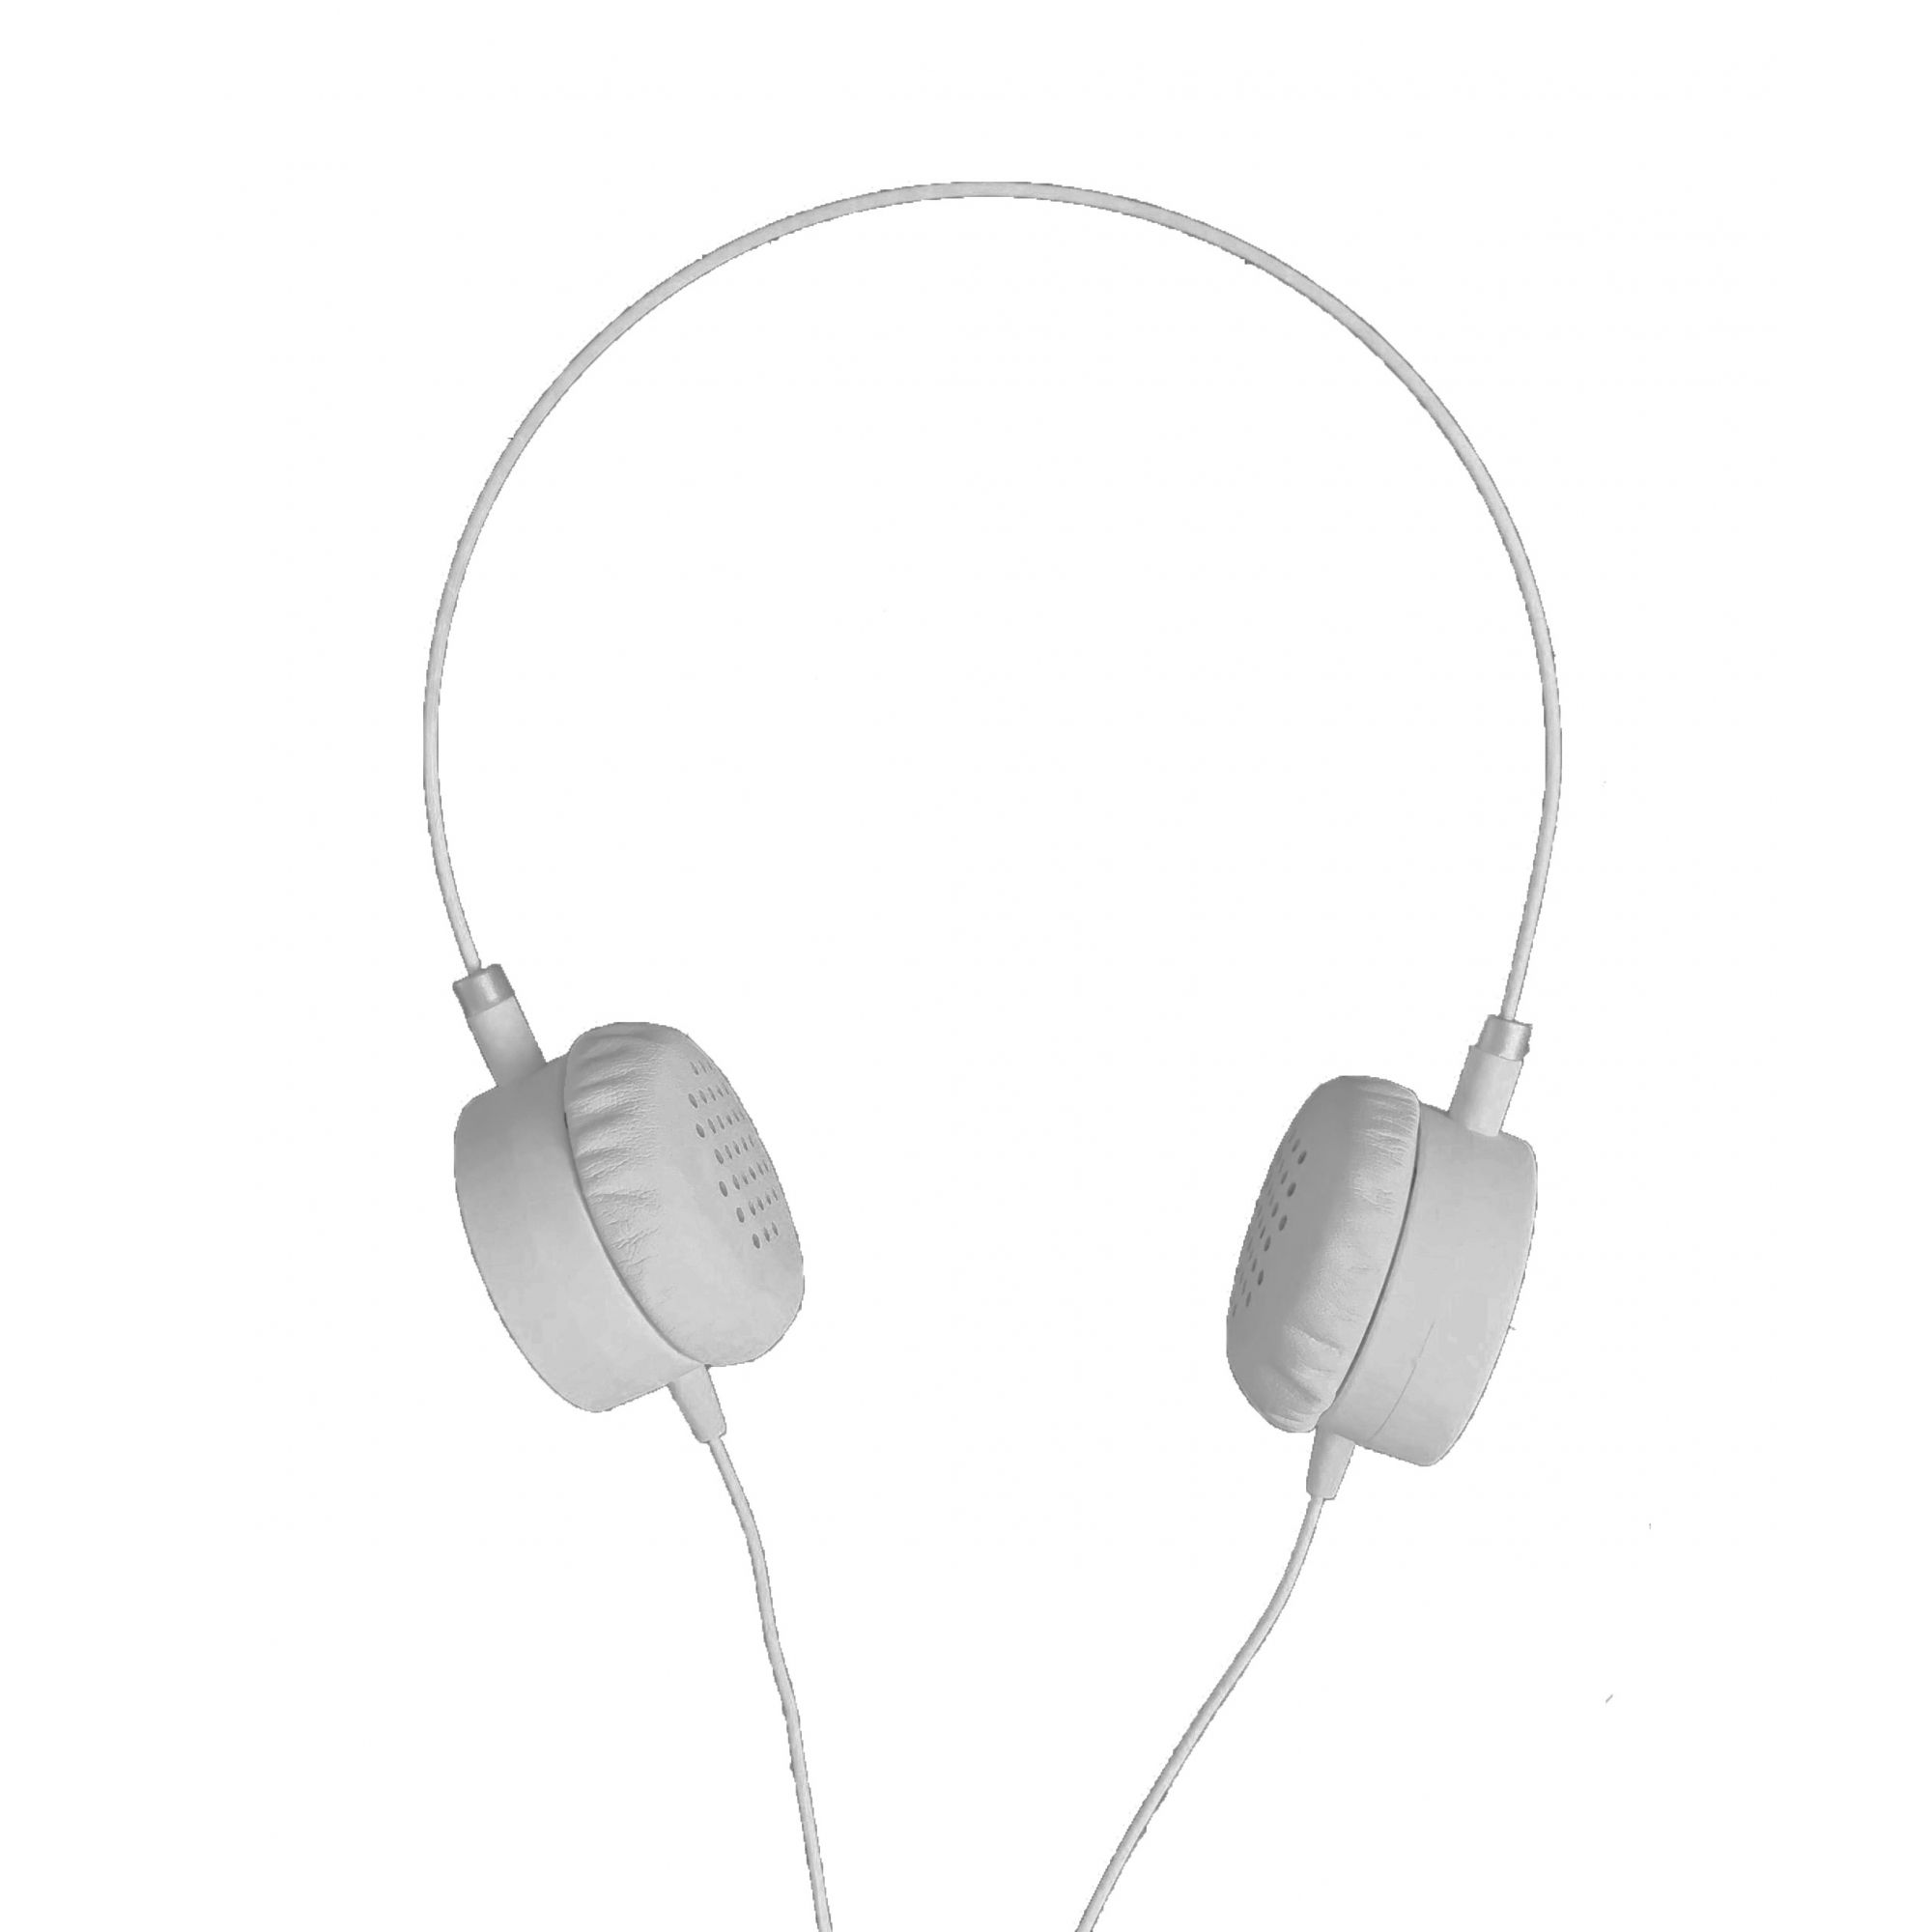 FONE DE OUVIDO HEADPHONE HP 31 PMCELL